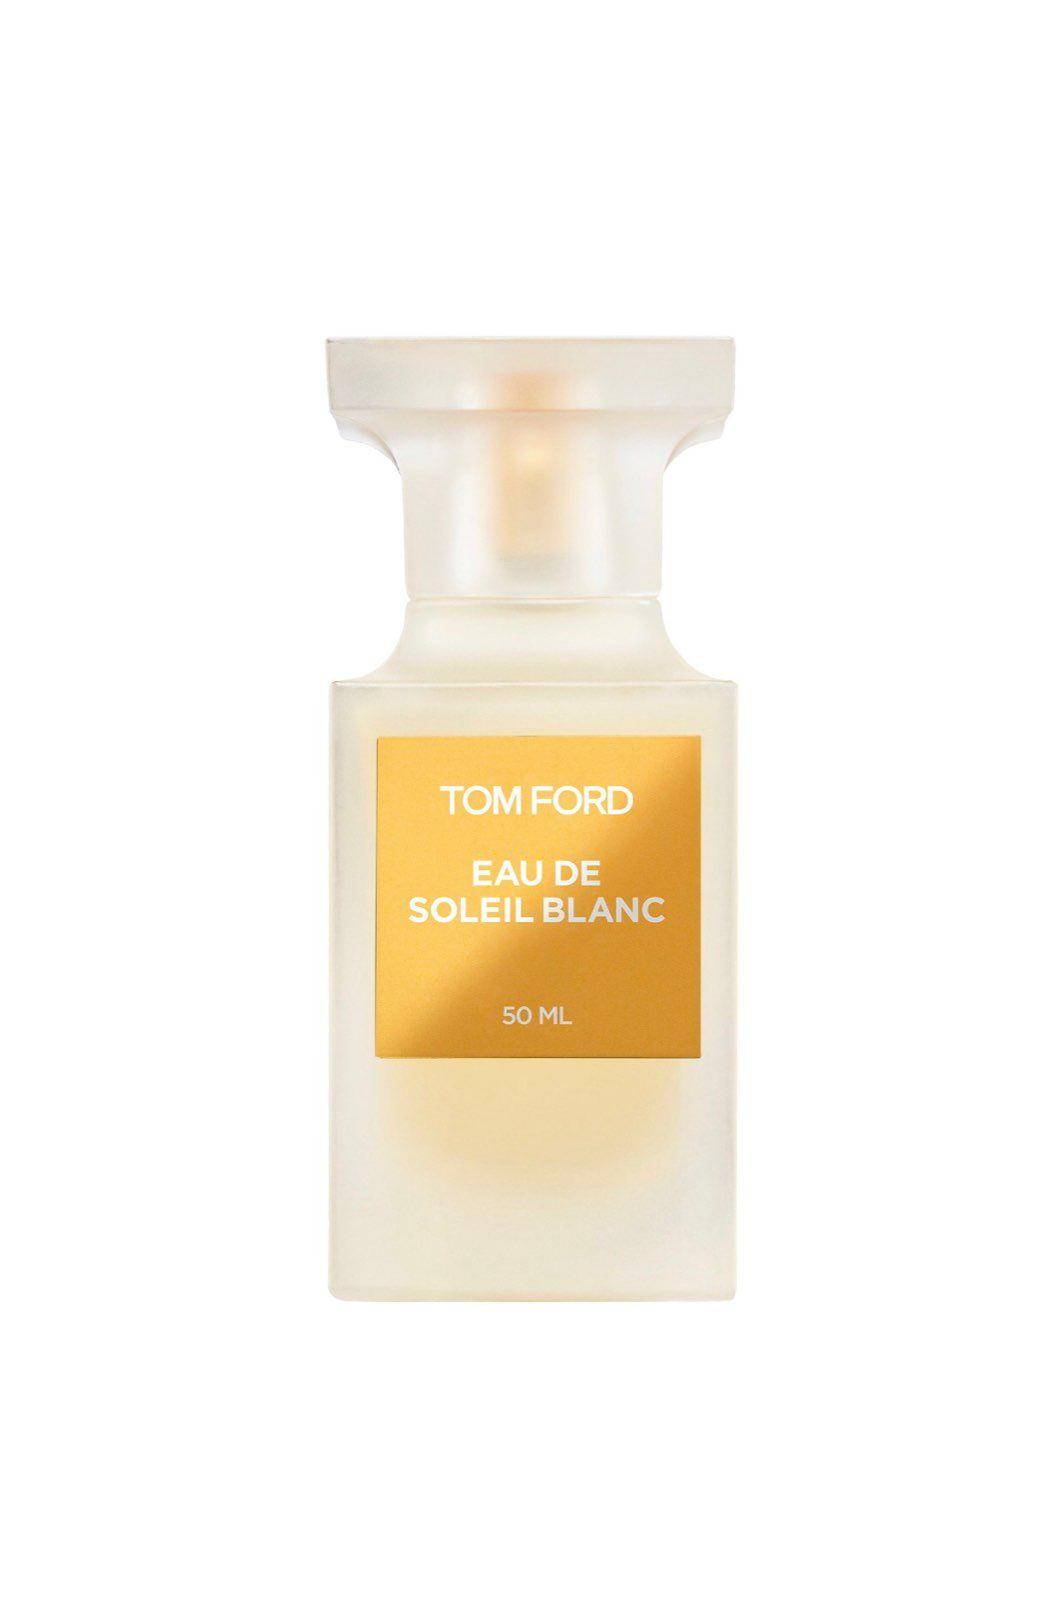 New In Box Authentic Tom Ford Soleil Blanc 1 7 Oz Crisp Radiant Addictive Eau De Soleil Blanc Embodies A Re Perfume Bottles Tom Ford Illuminations